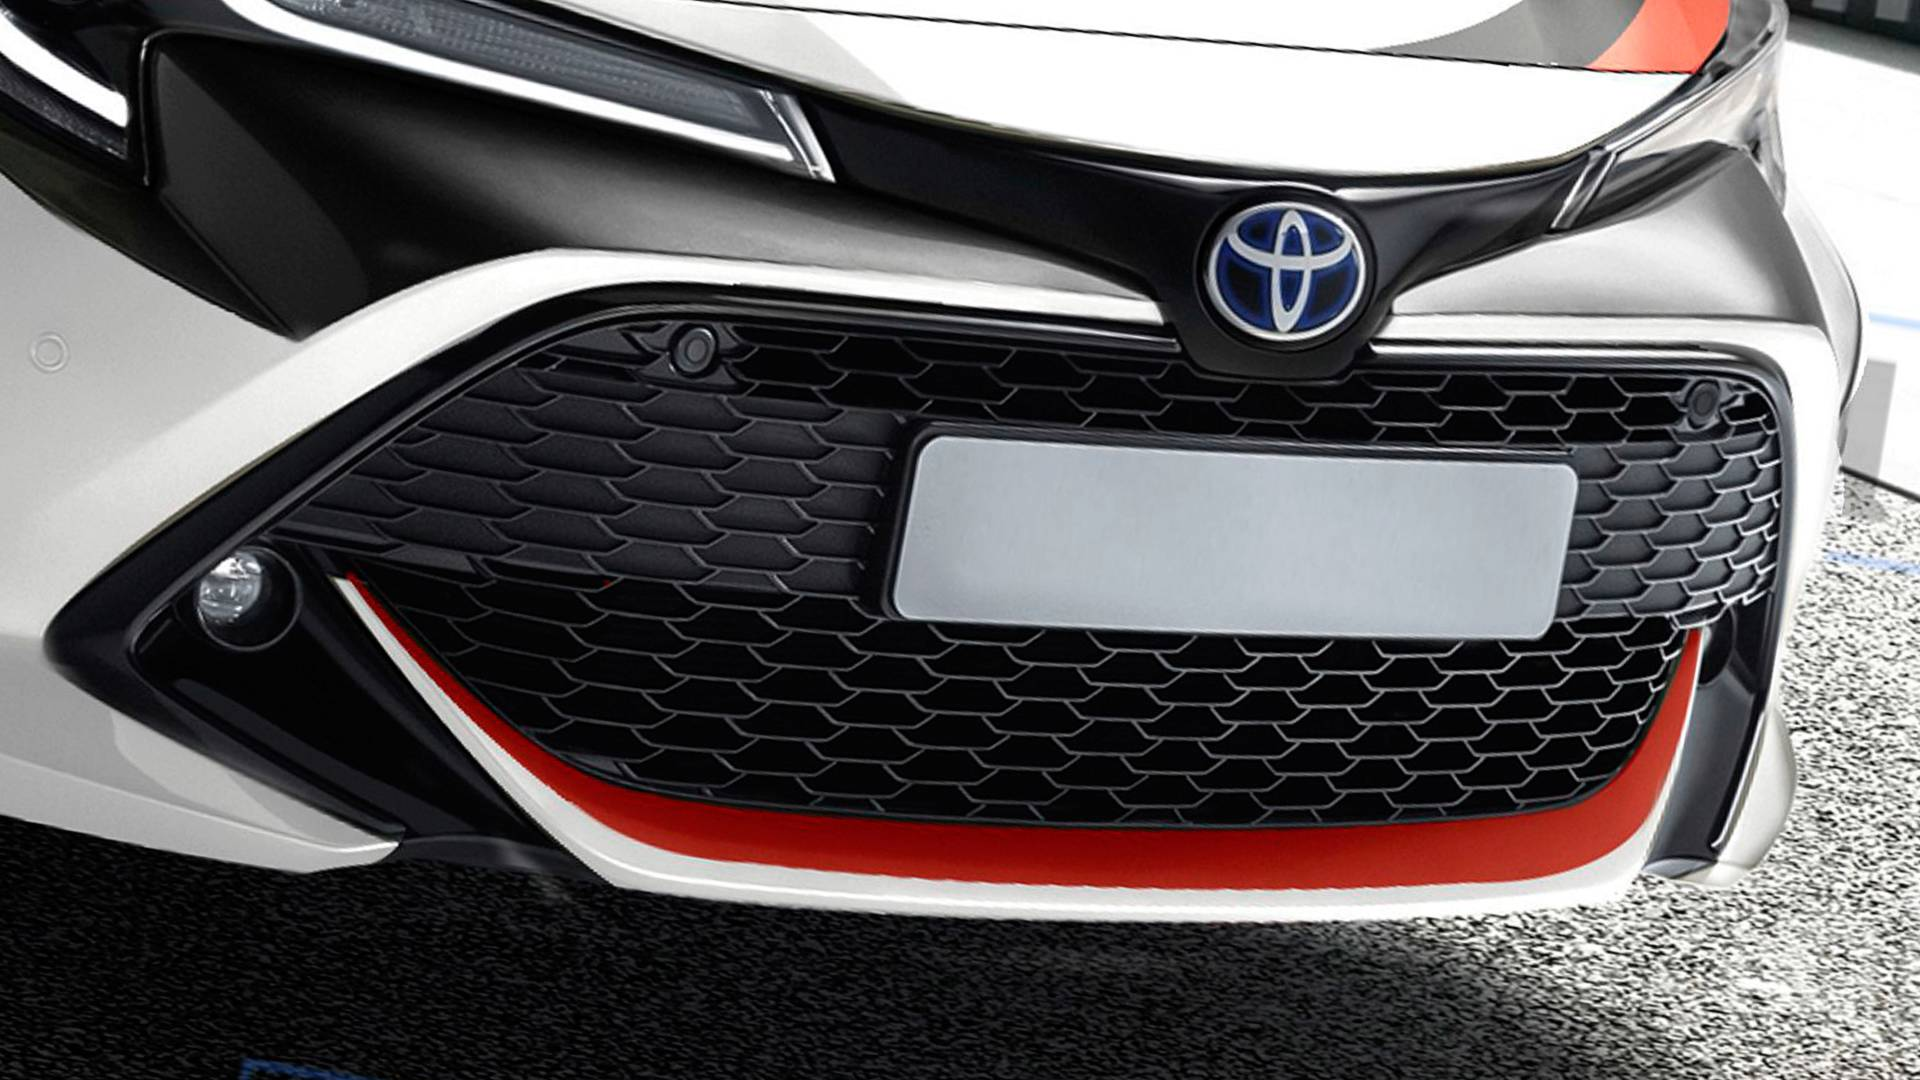 Toyota Corolla GR - Projeção